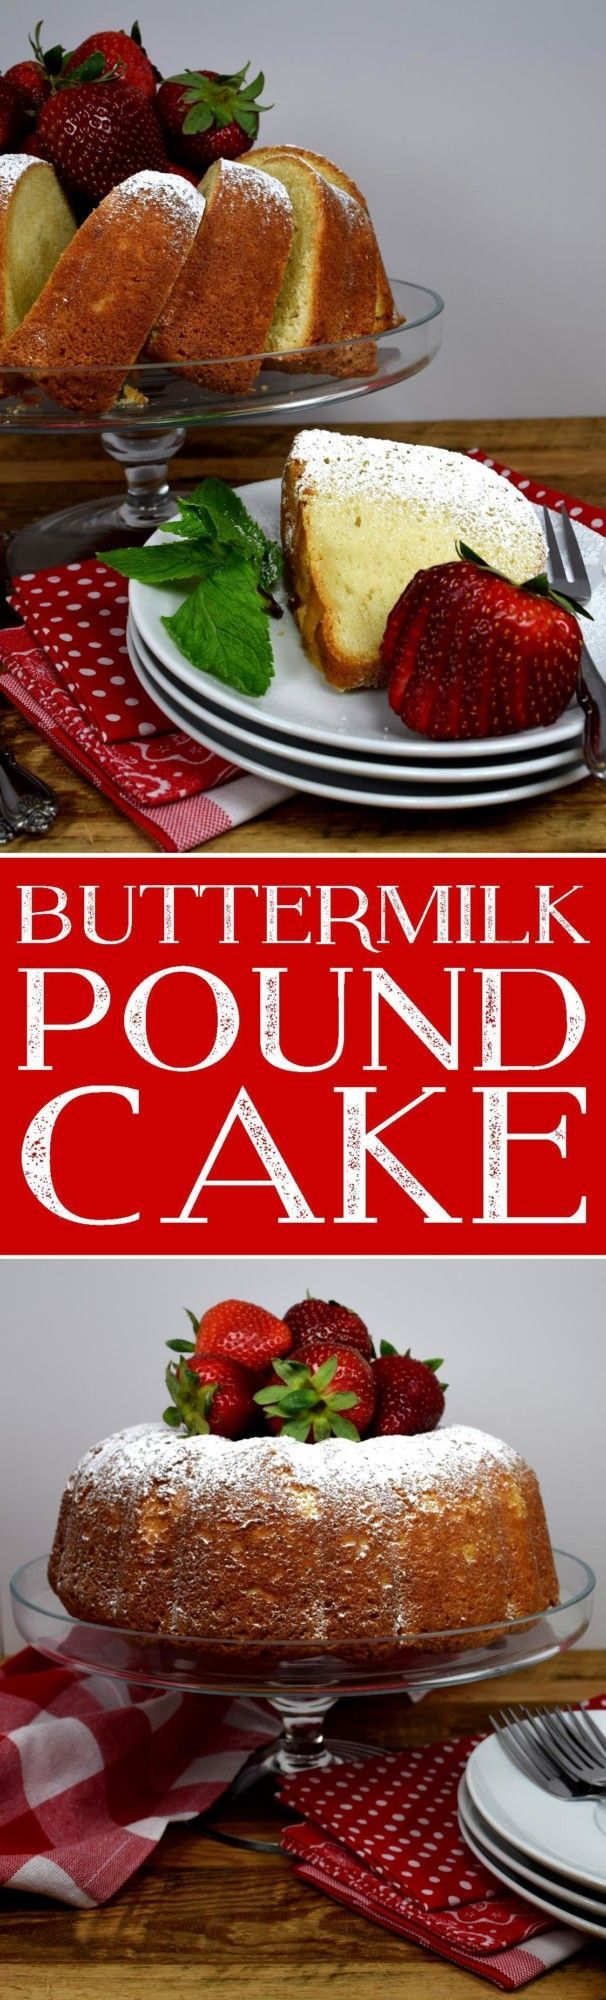 Chocolate Pound Cake With Buttermilk